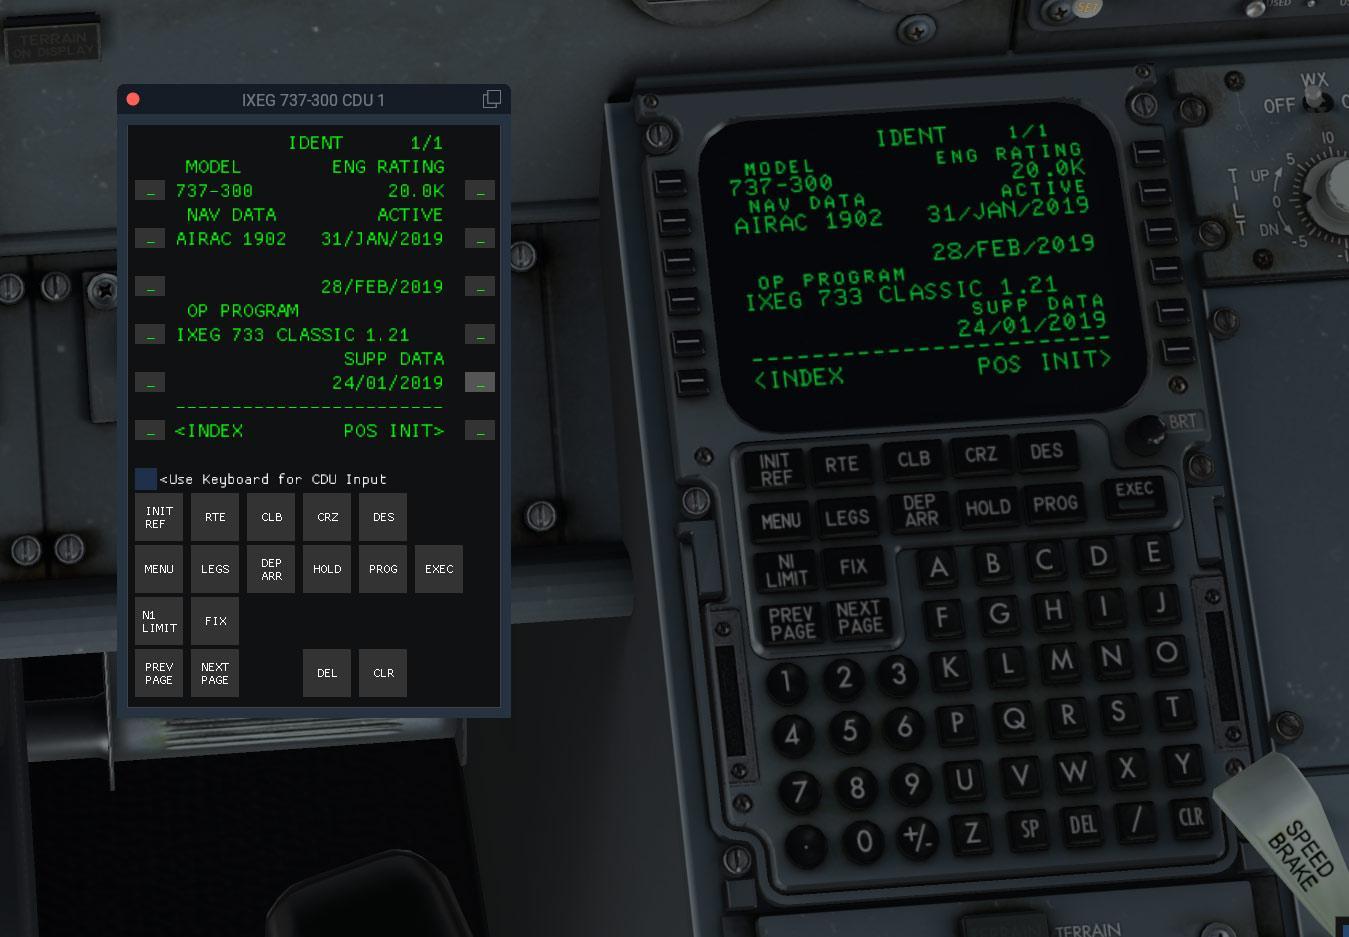 Window CDU for IXEG 737-300 - Plugins and Utilities - X-Pilot